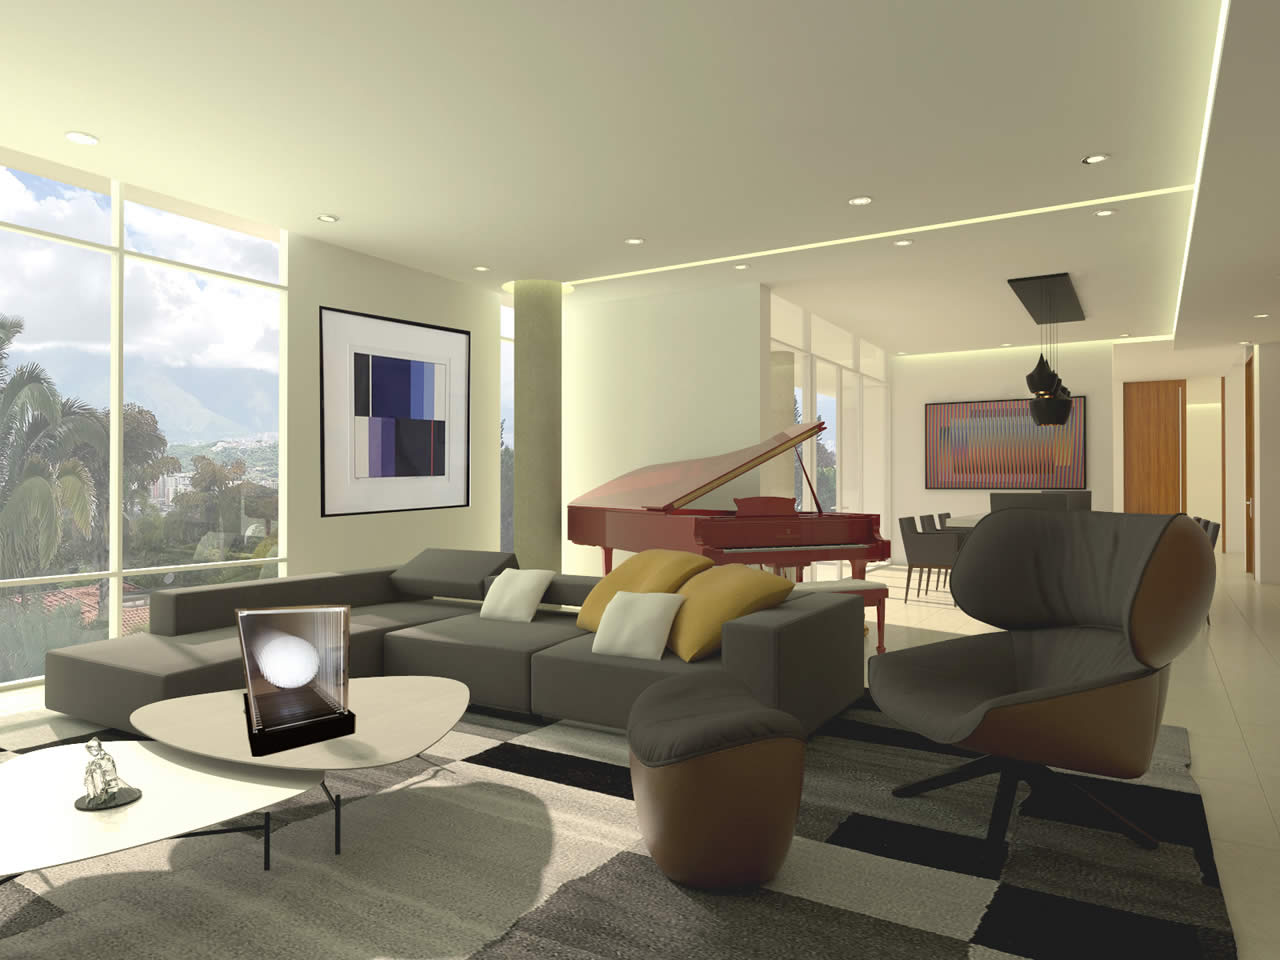 Casa 18-20 Interiores